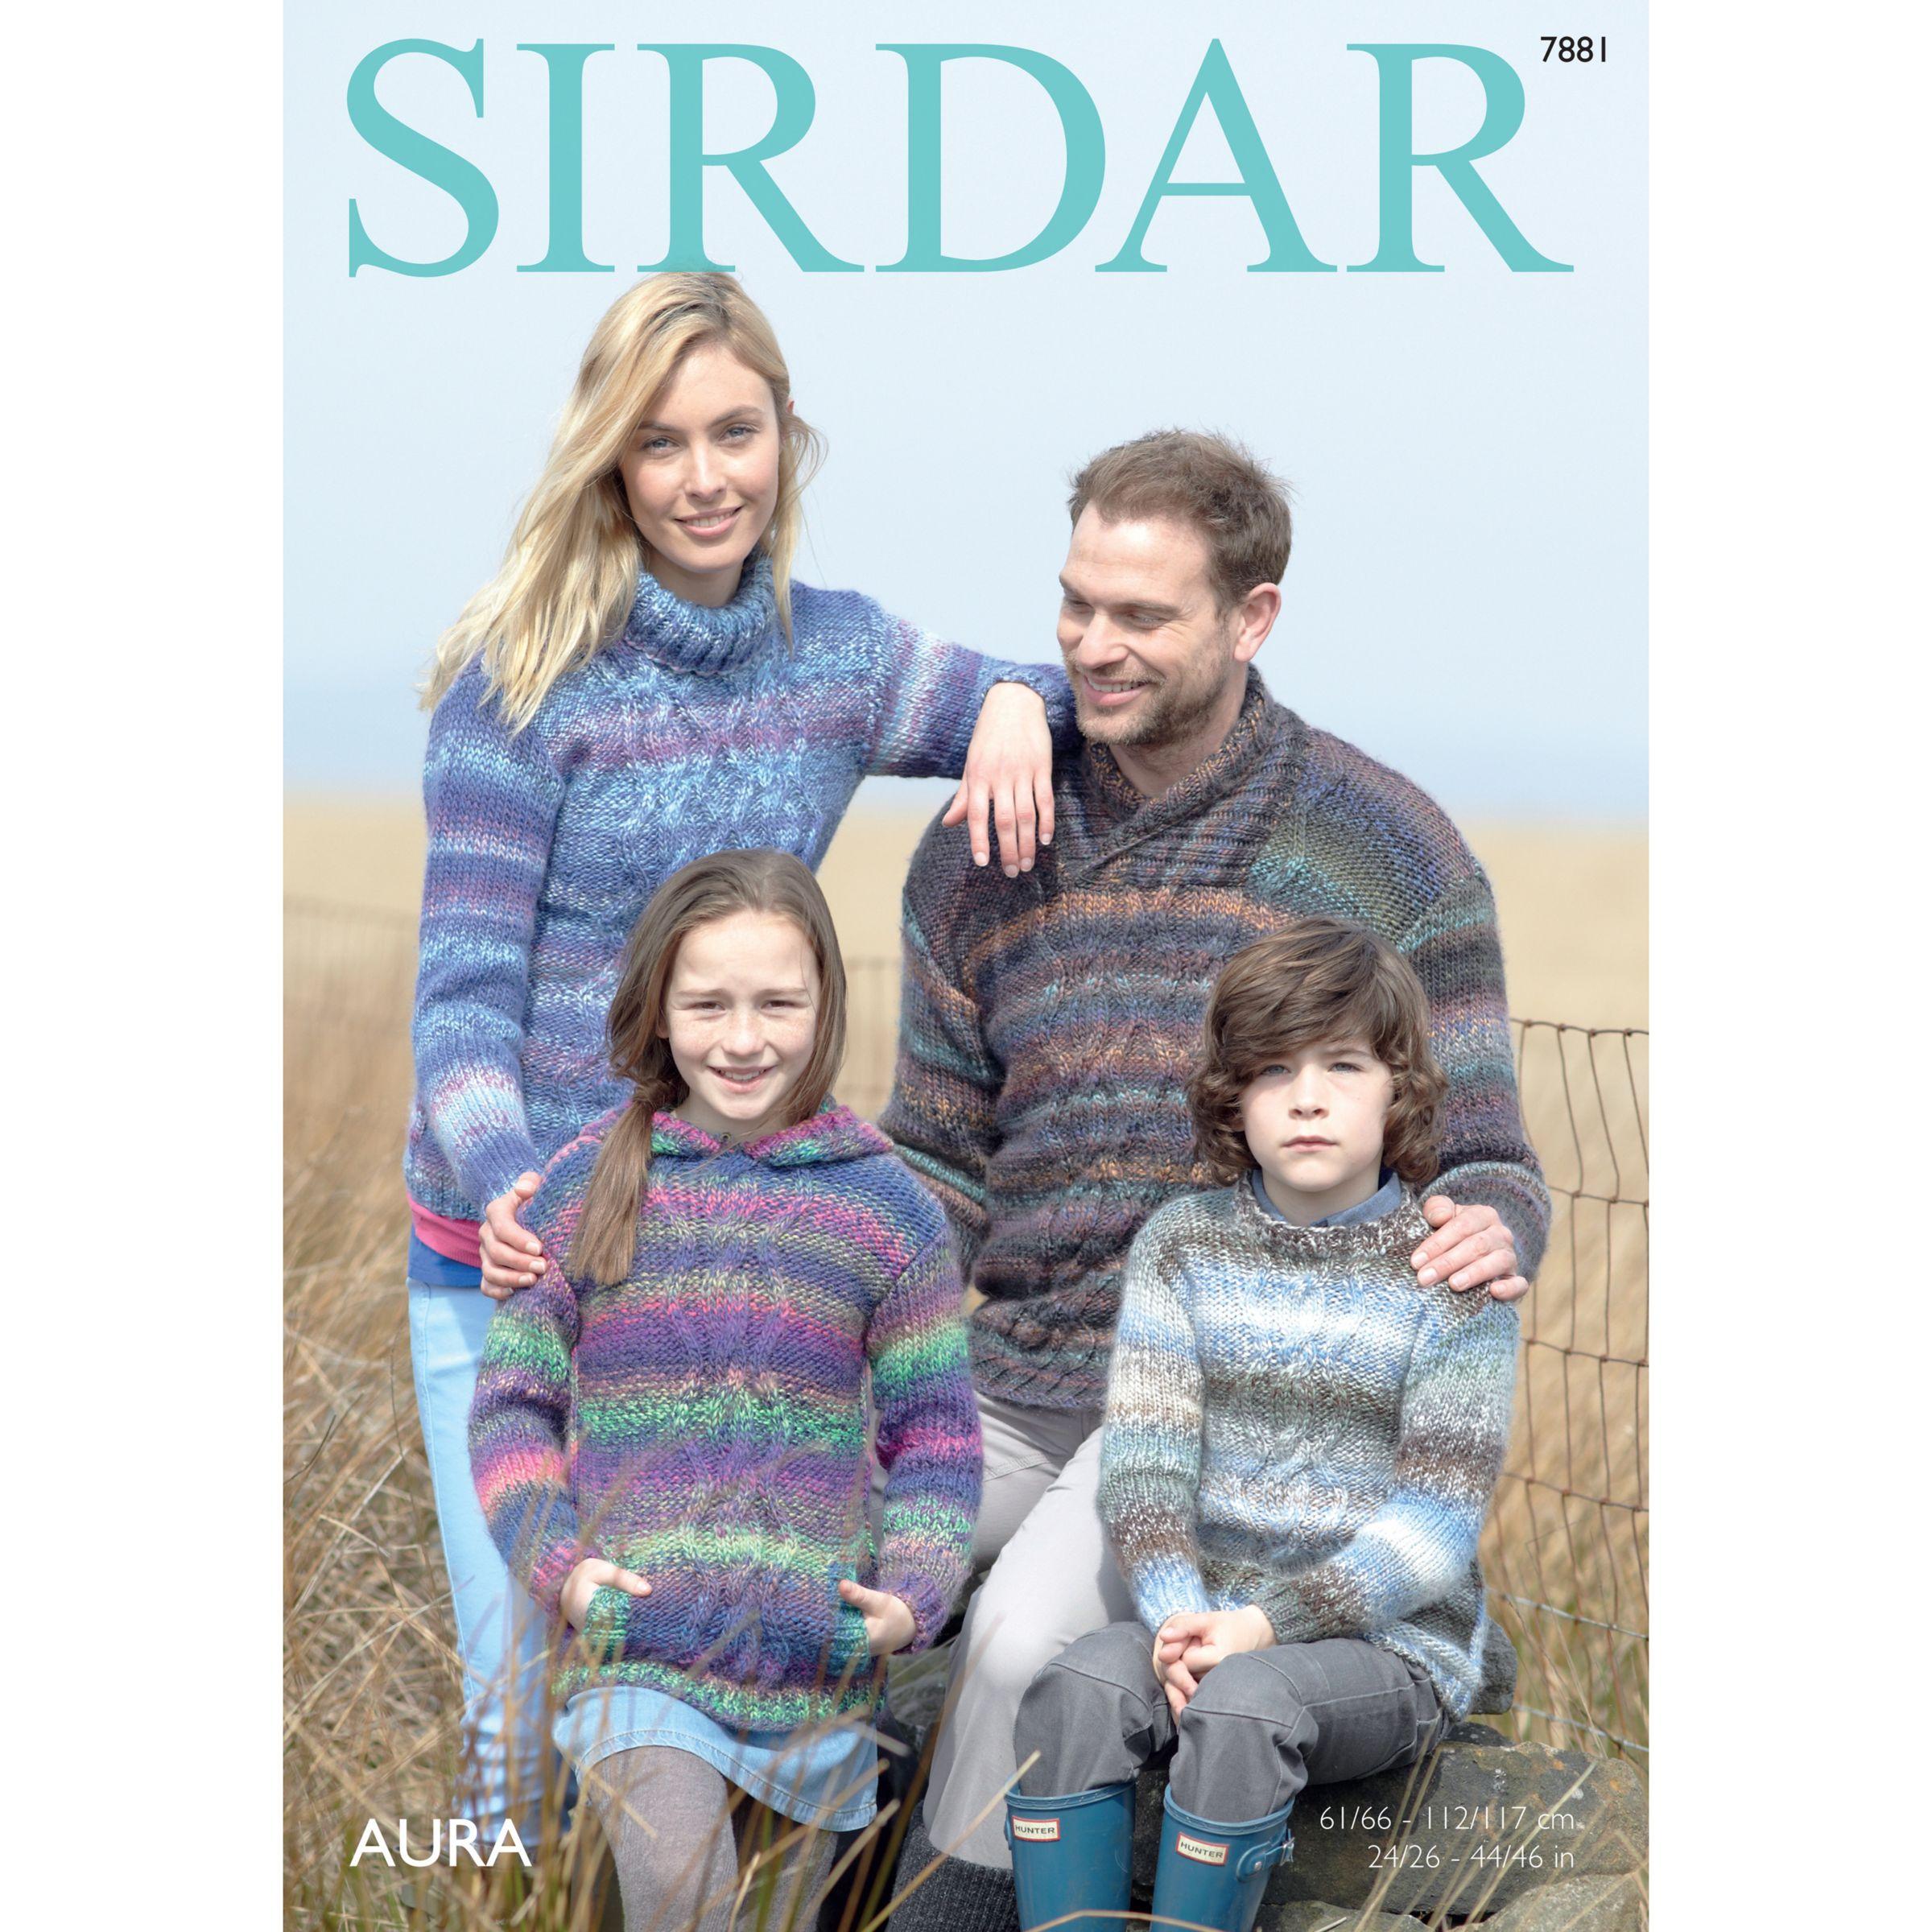 Sirdar Sirdar Aura Chunky Jumpers Knitting Pattern, 7881